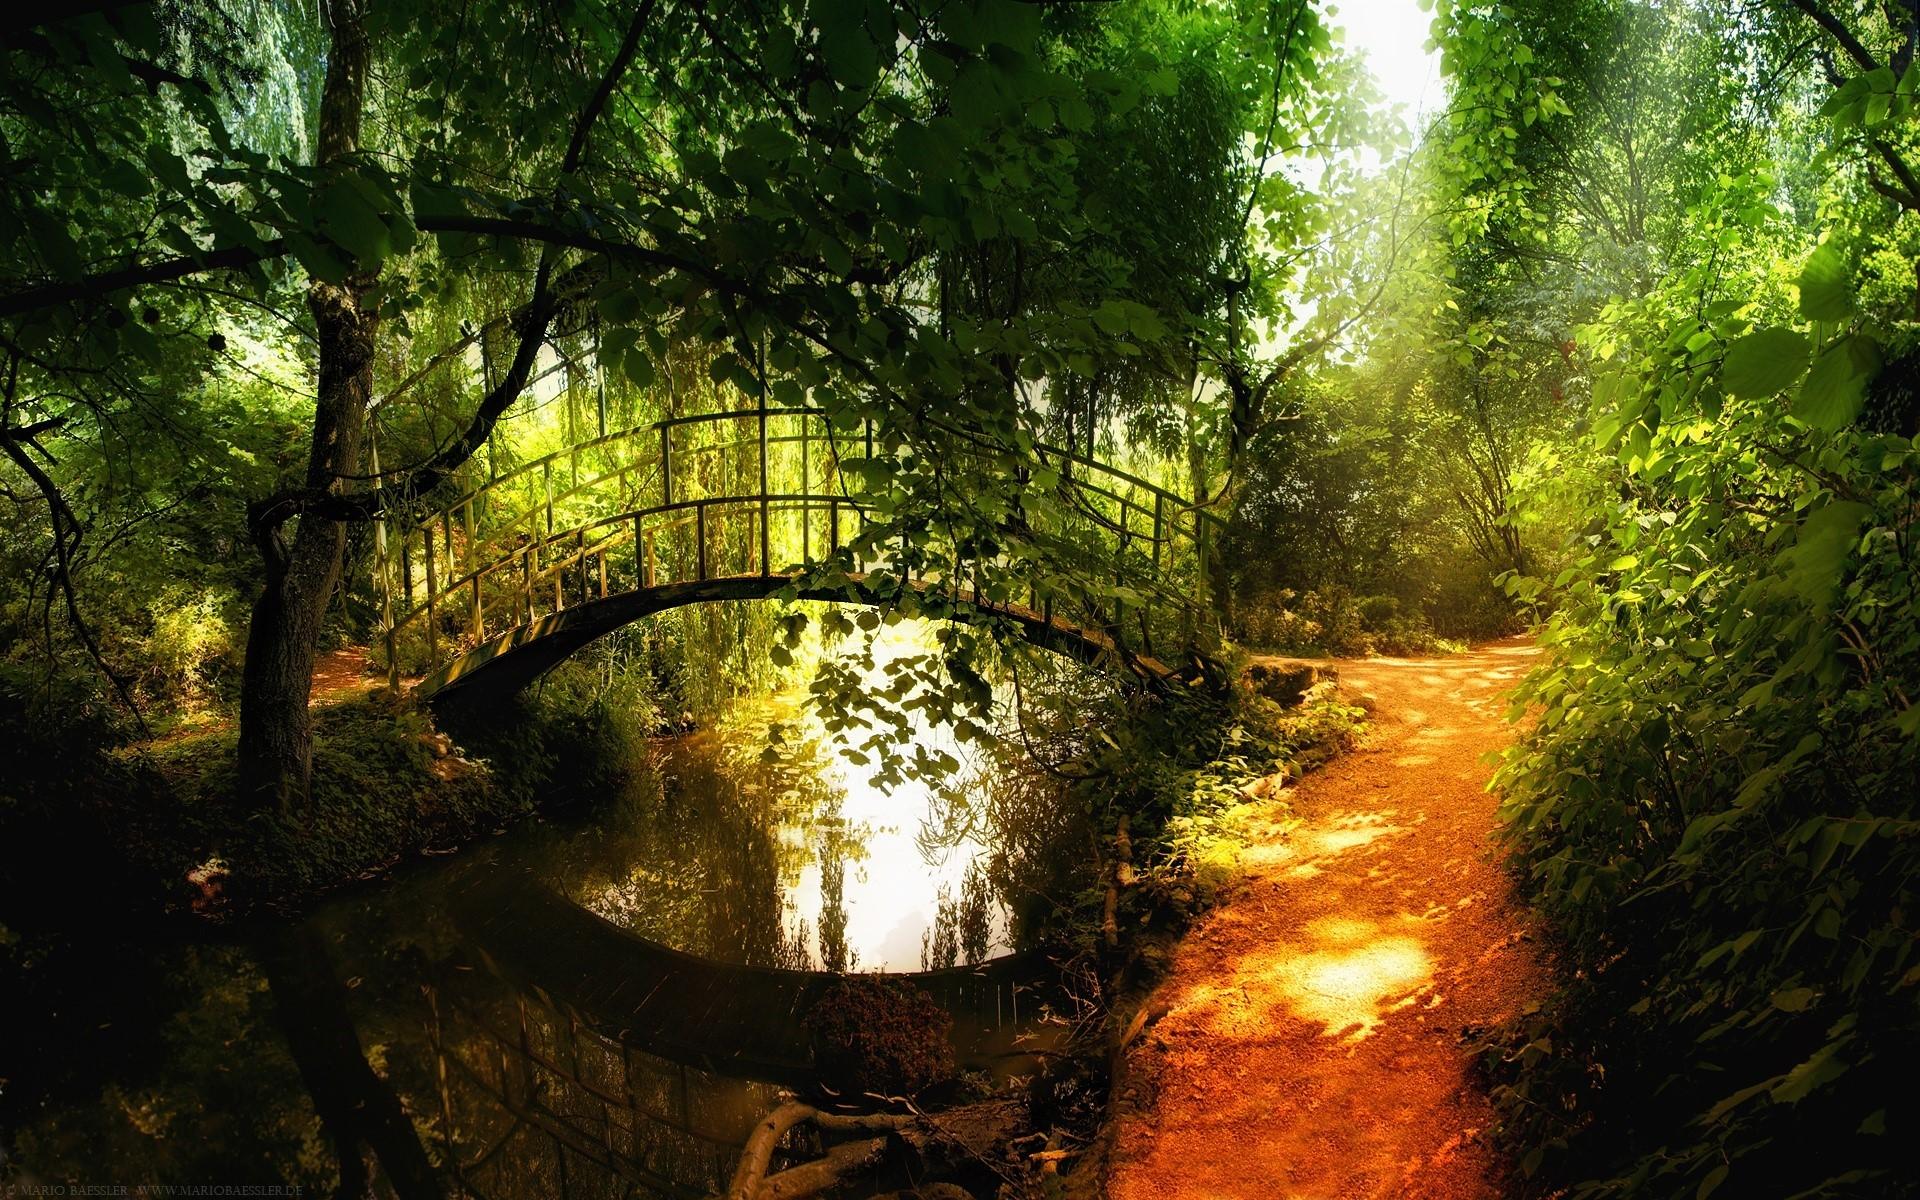 Forest path bridge